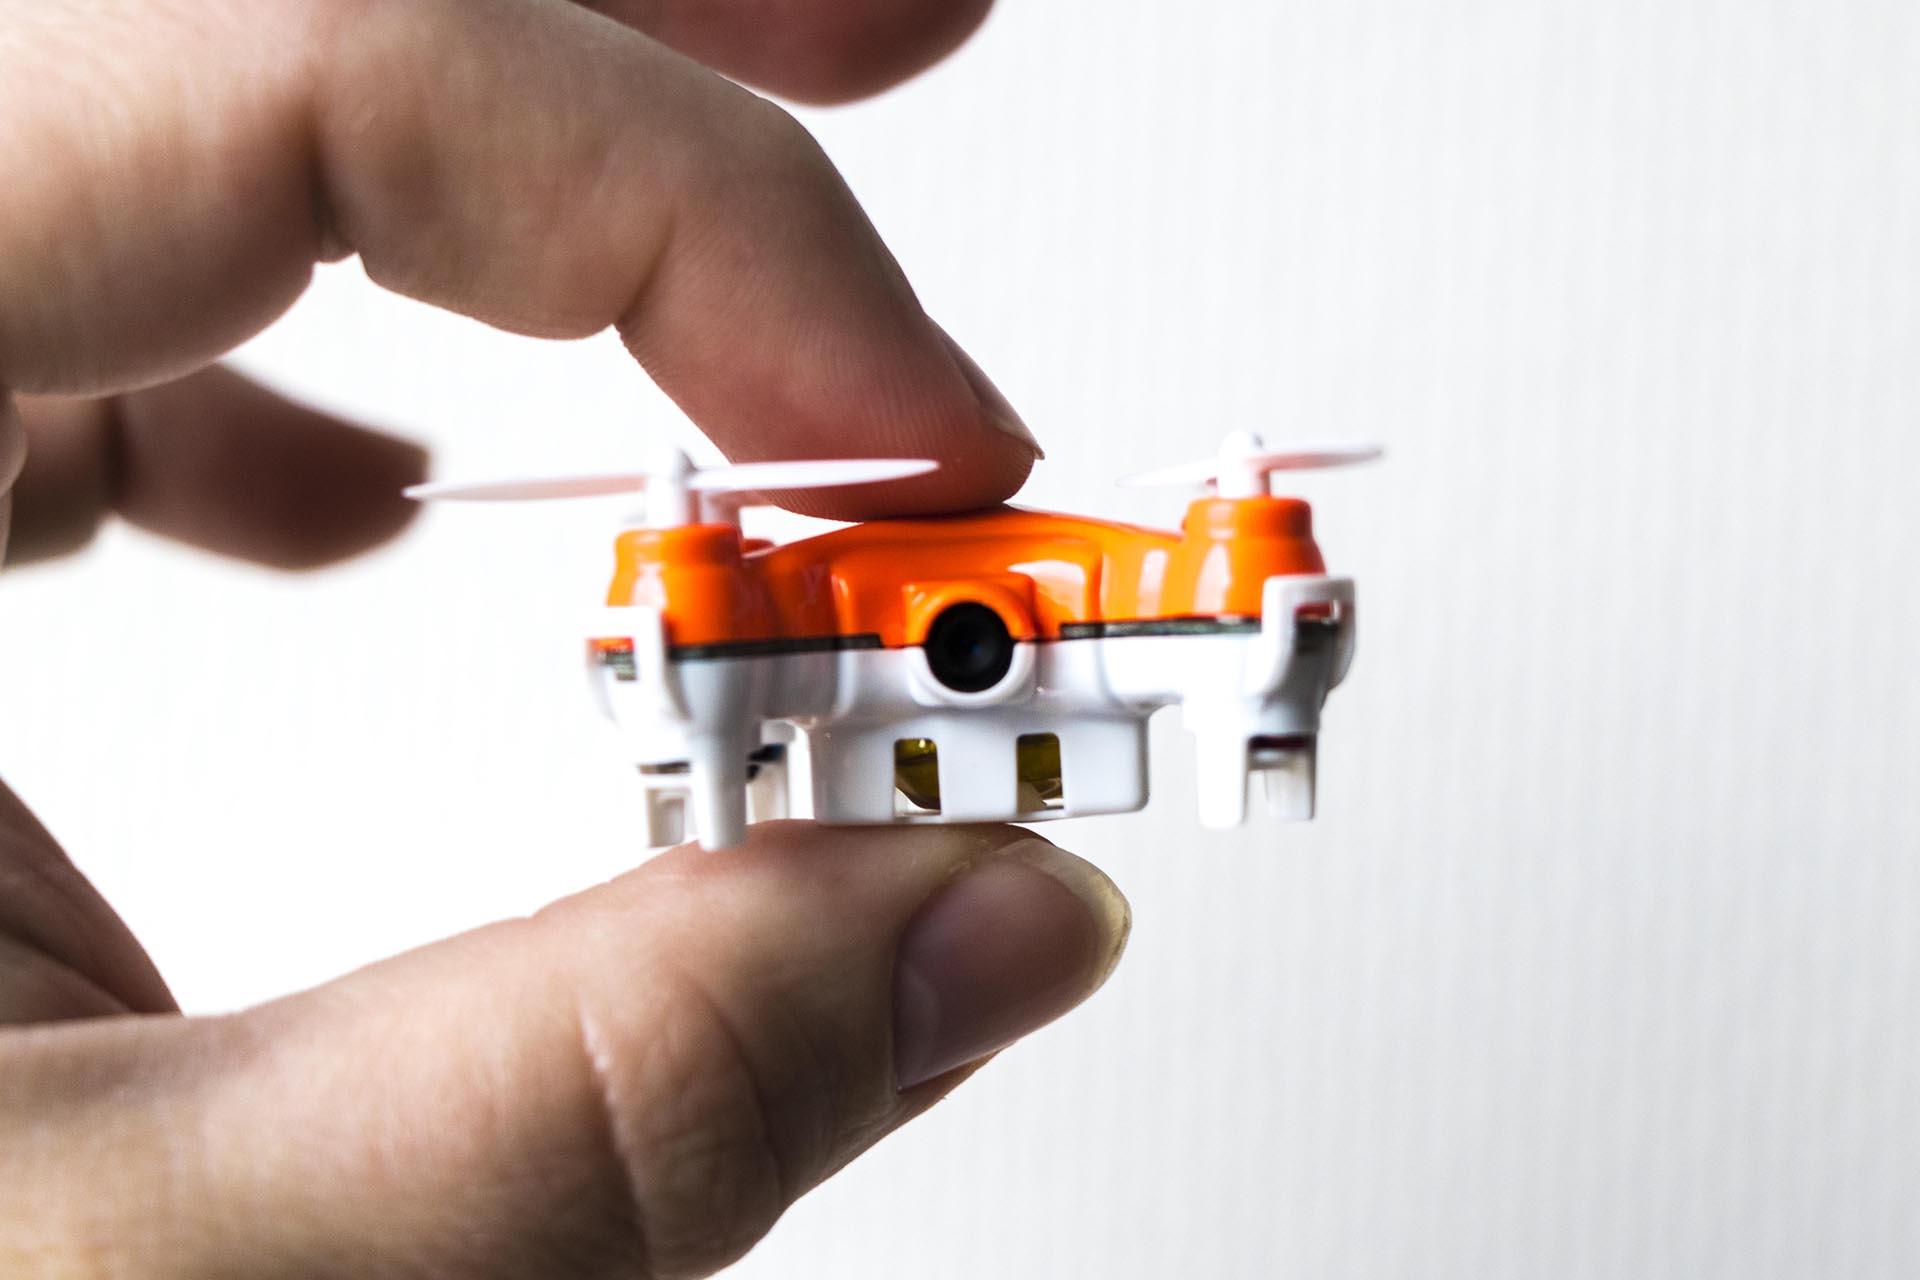 TRNDlabs Skeye Nano Drone With Camera IMG 8190